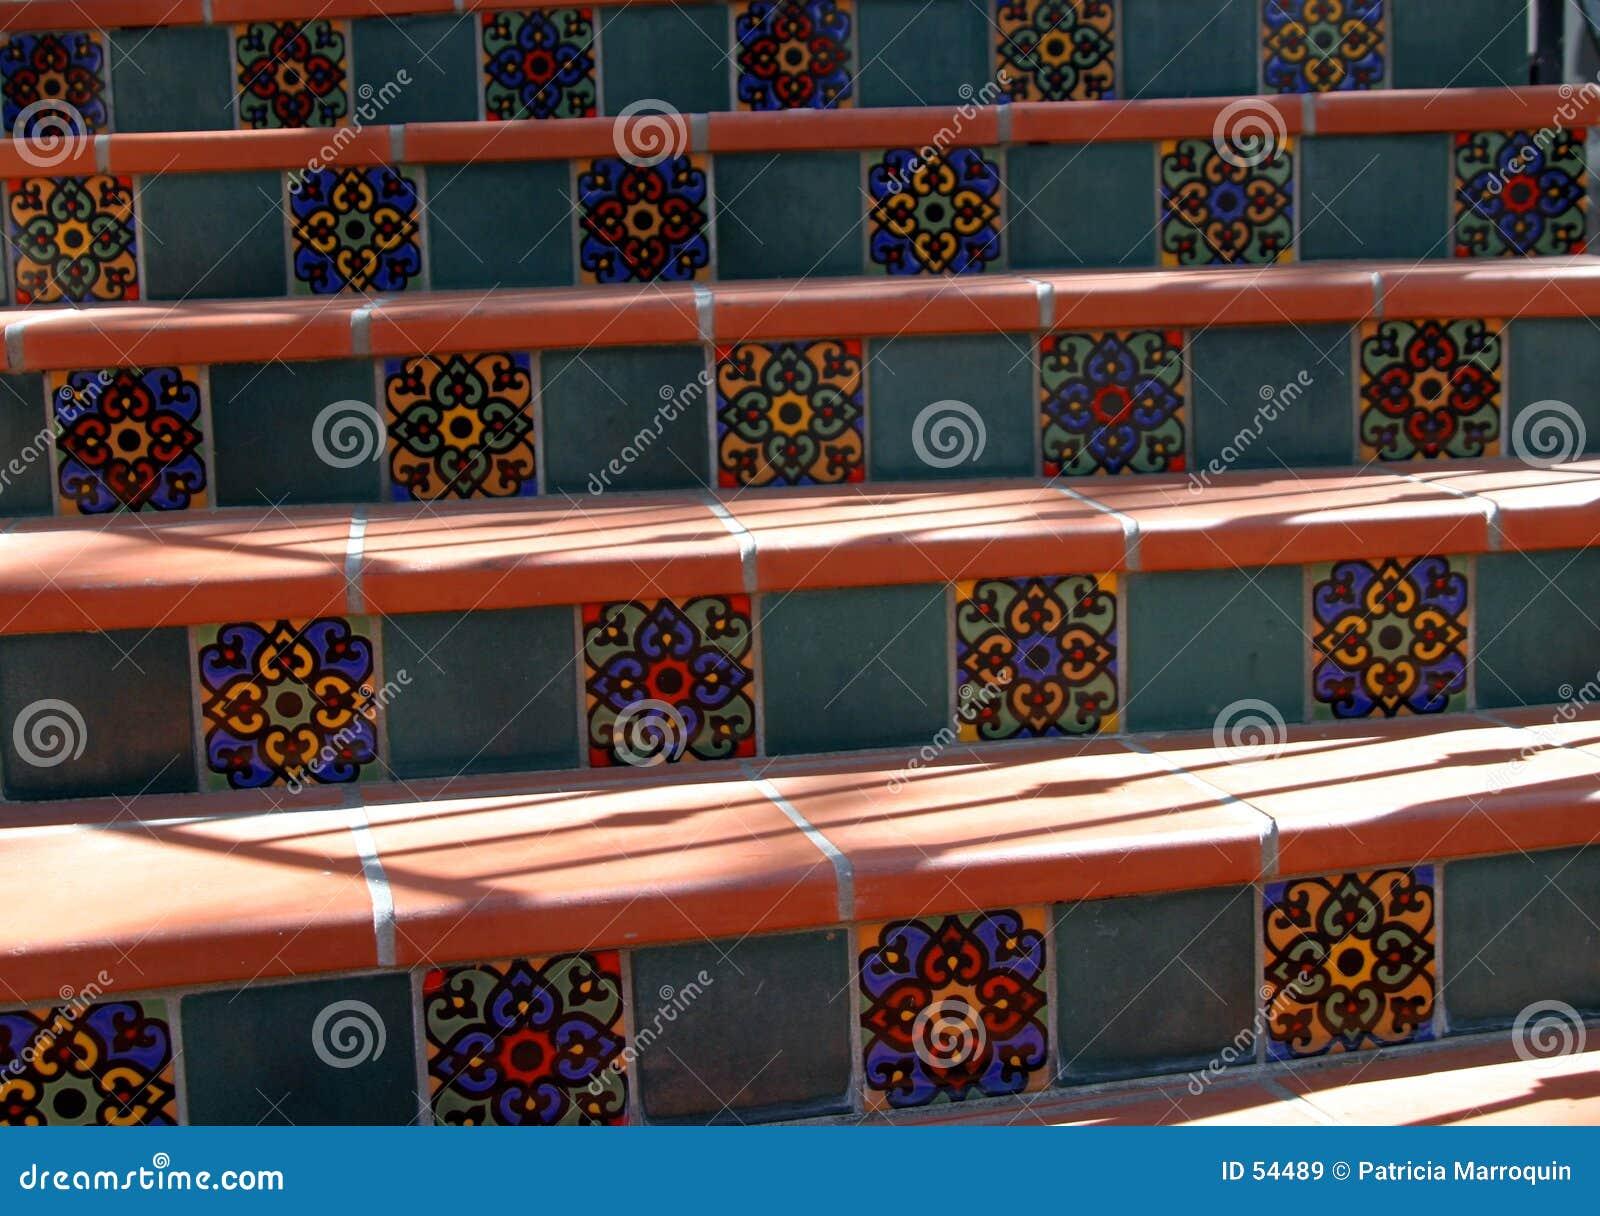 Download ισπανικά βήματα στοκ εικόνα. εικόνα από αρχιτεκτονικής, υλικό - 54489